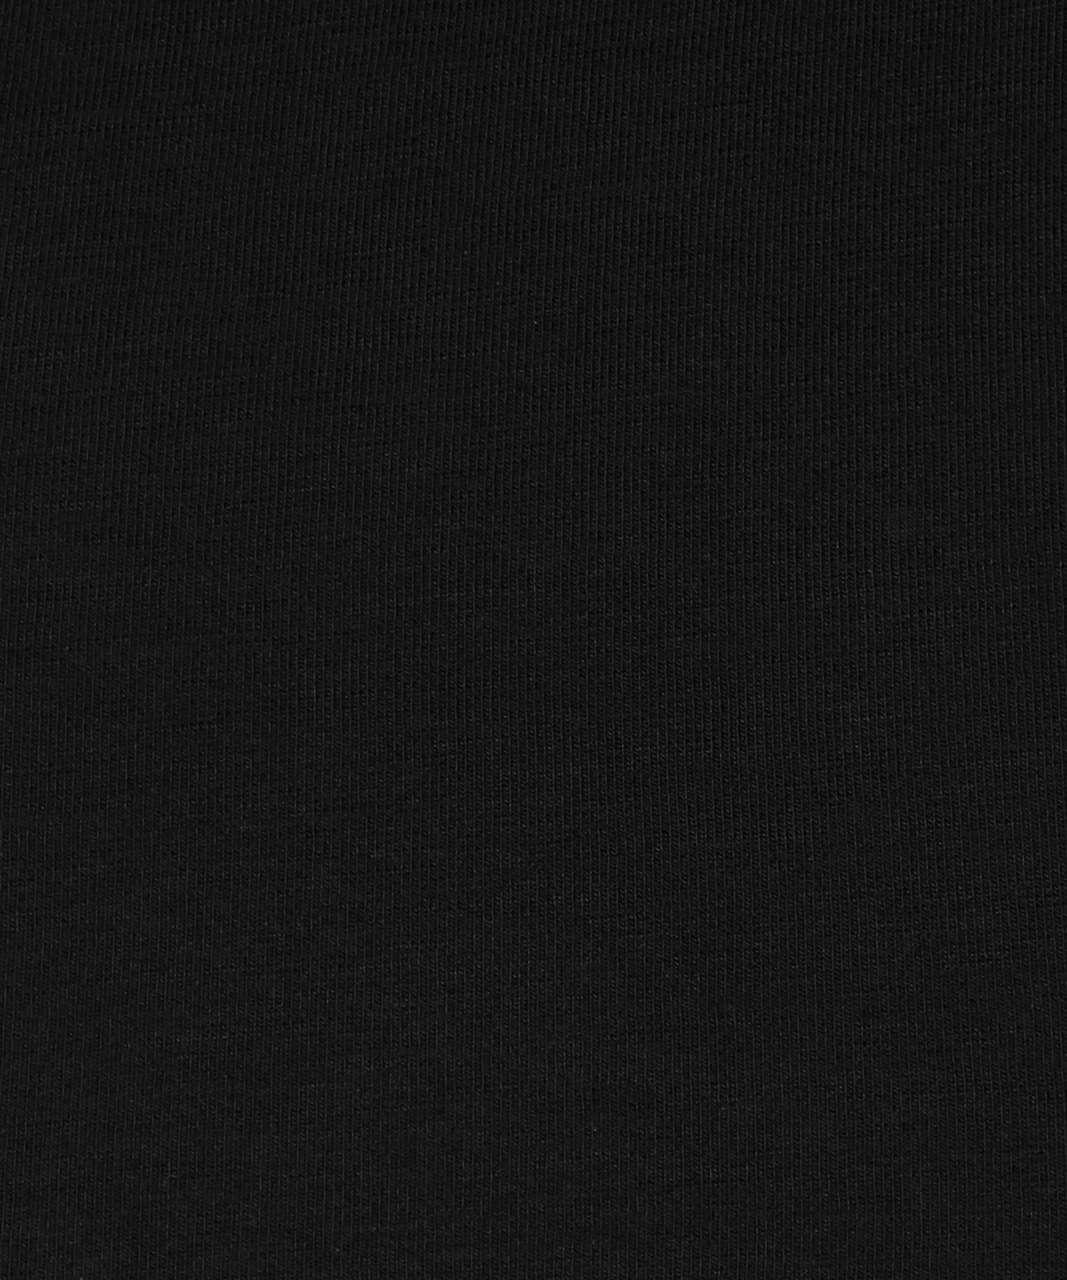 Lululemon Back In Action Long Sleeve - Black (Third Release)